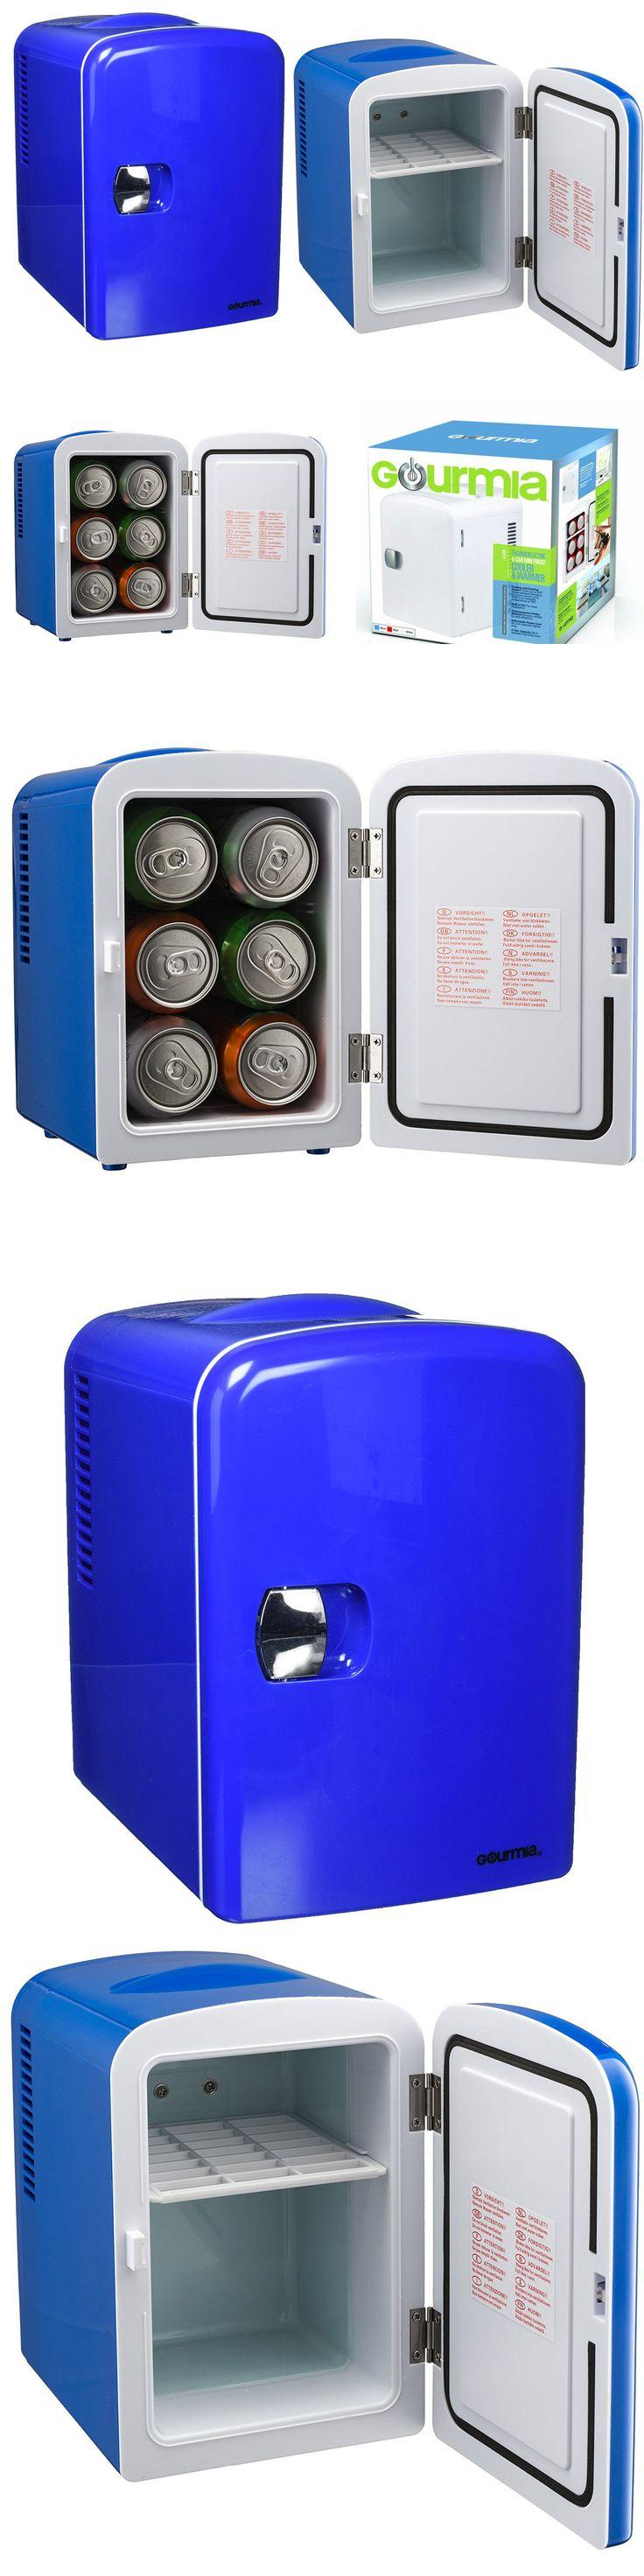 Solar Powered Mini Fridge Best 20 Small Fridge Freezer Ideas On Pinterest Sliding Drawers